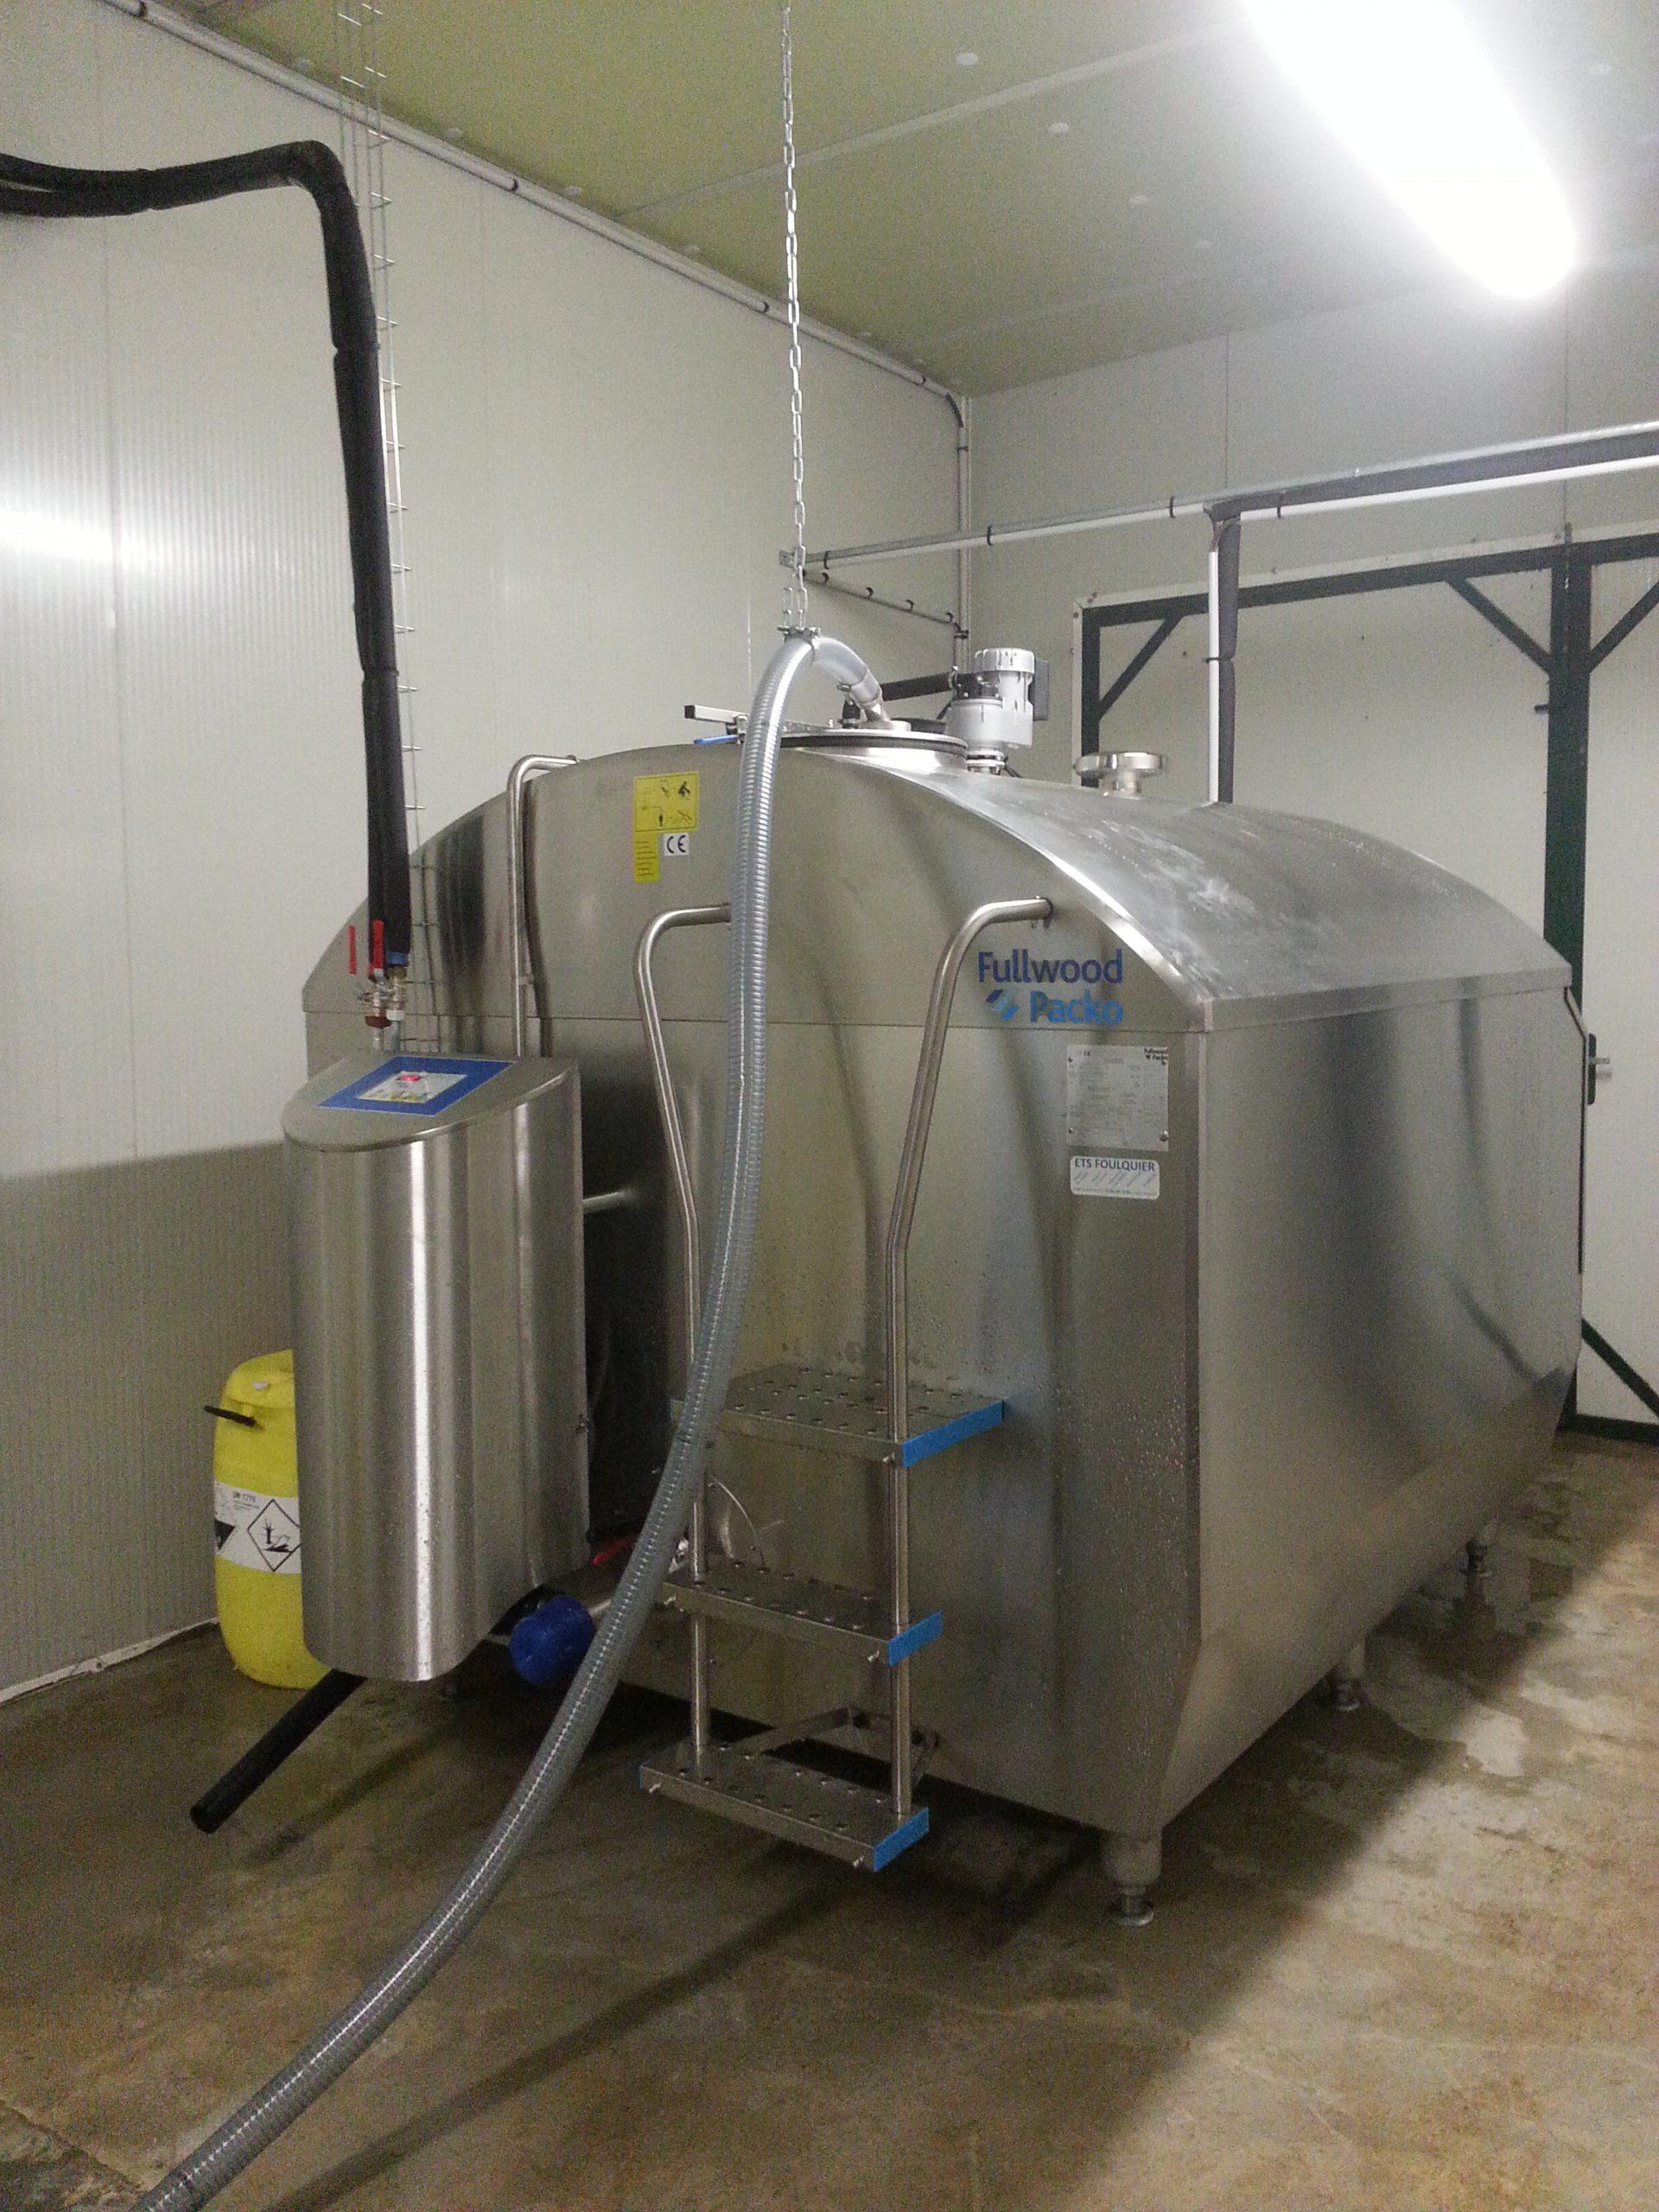 Tank lait eau glacee 1 ets foulquier traite tarn aveyron